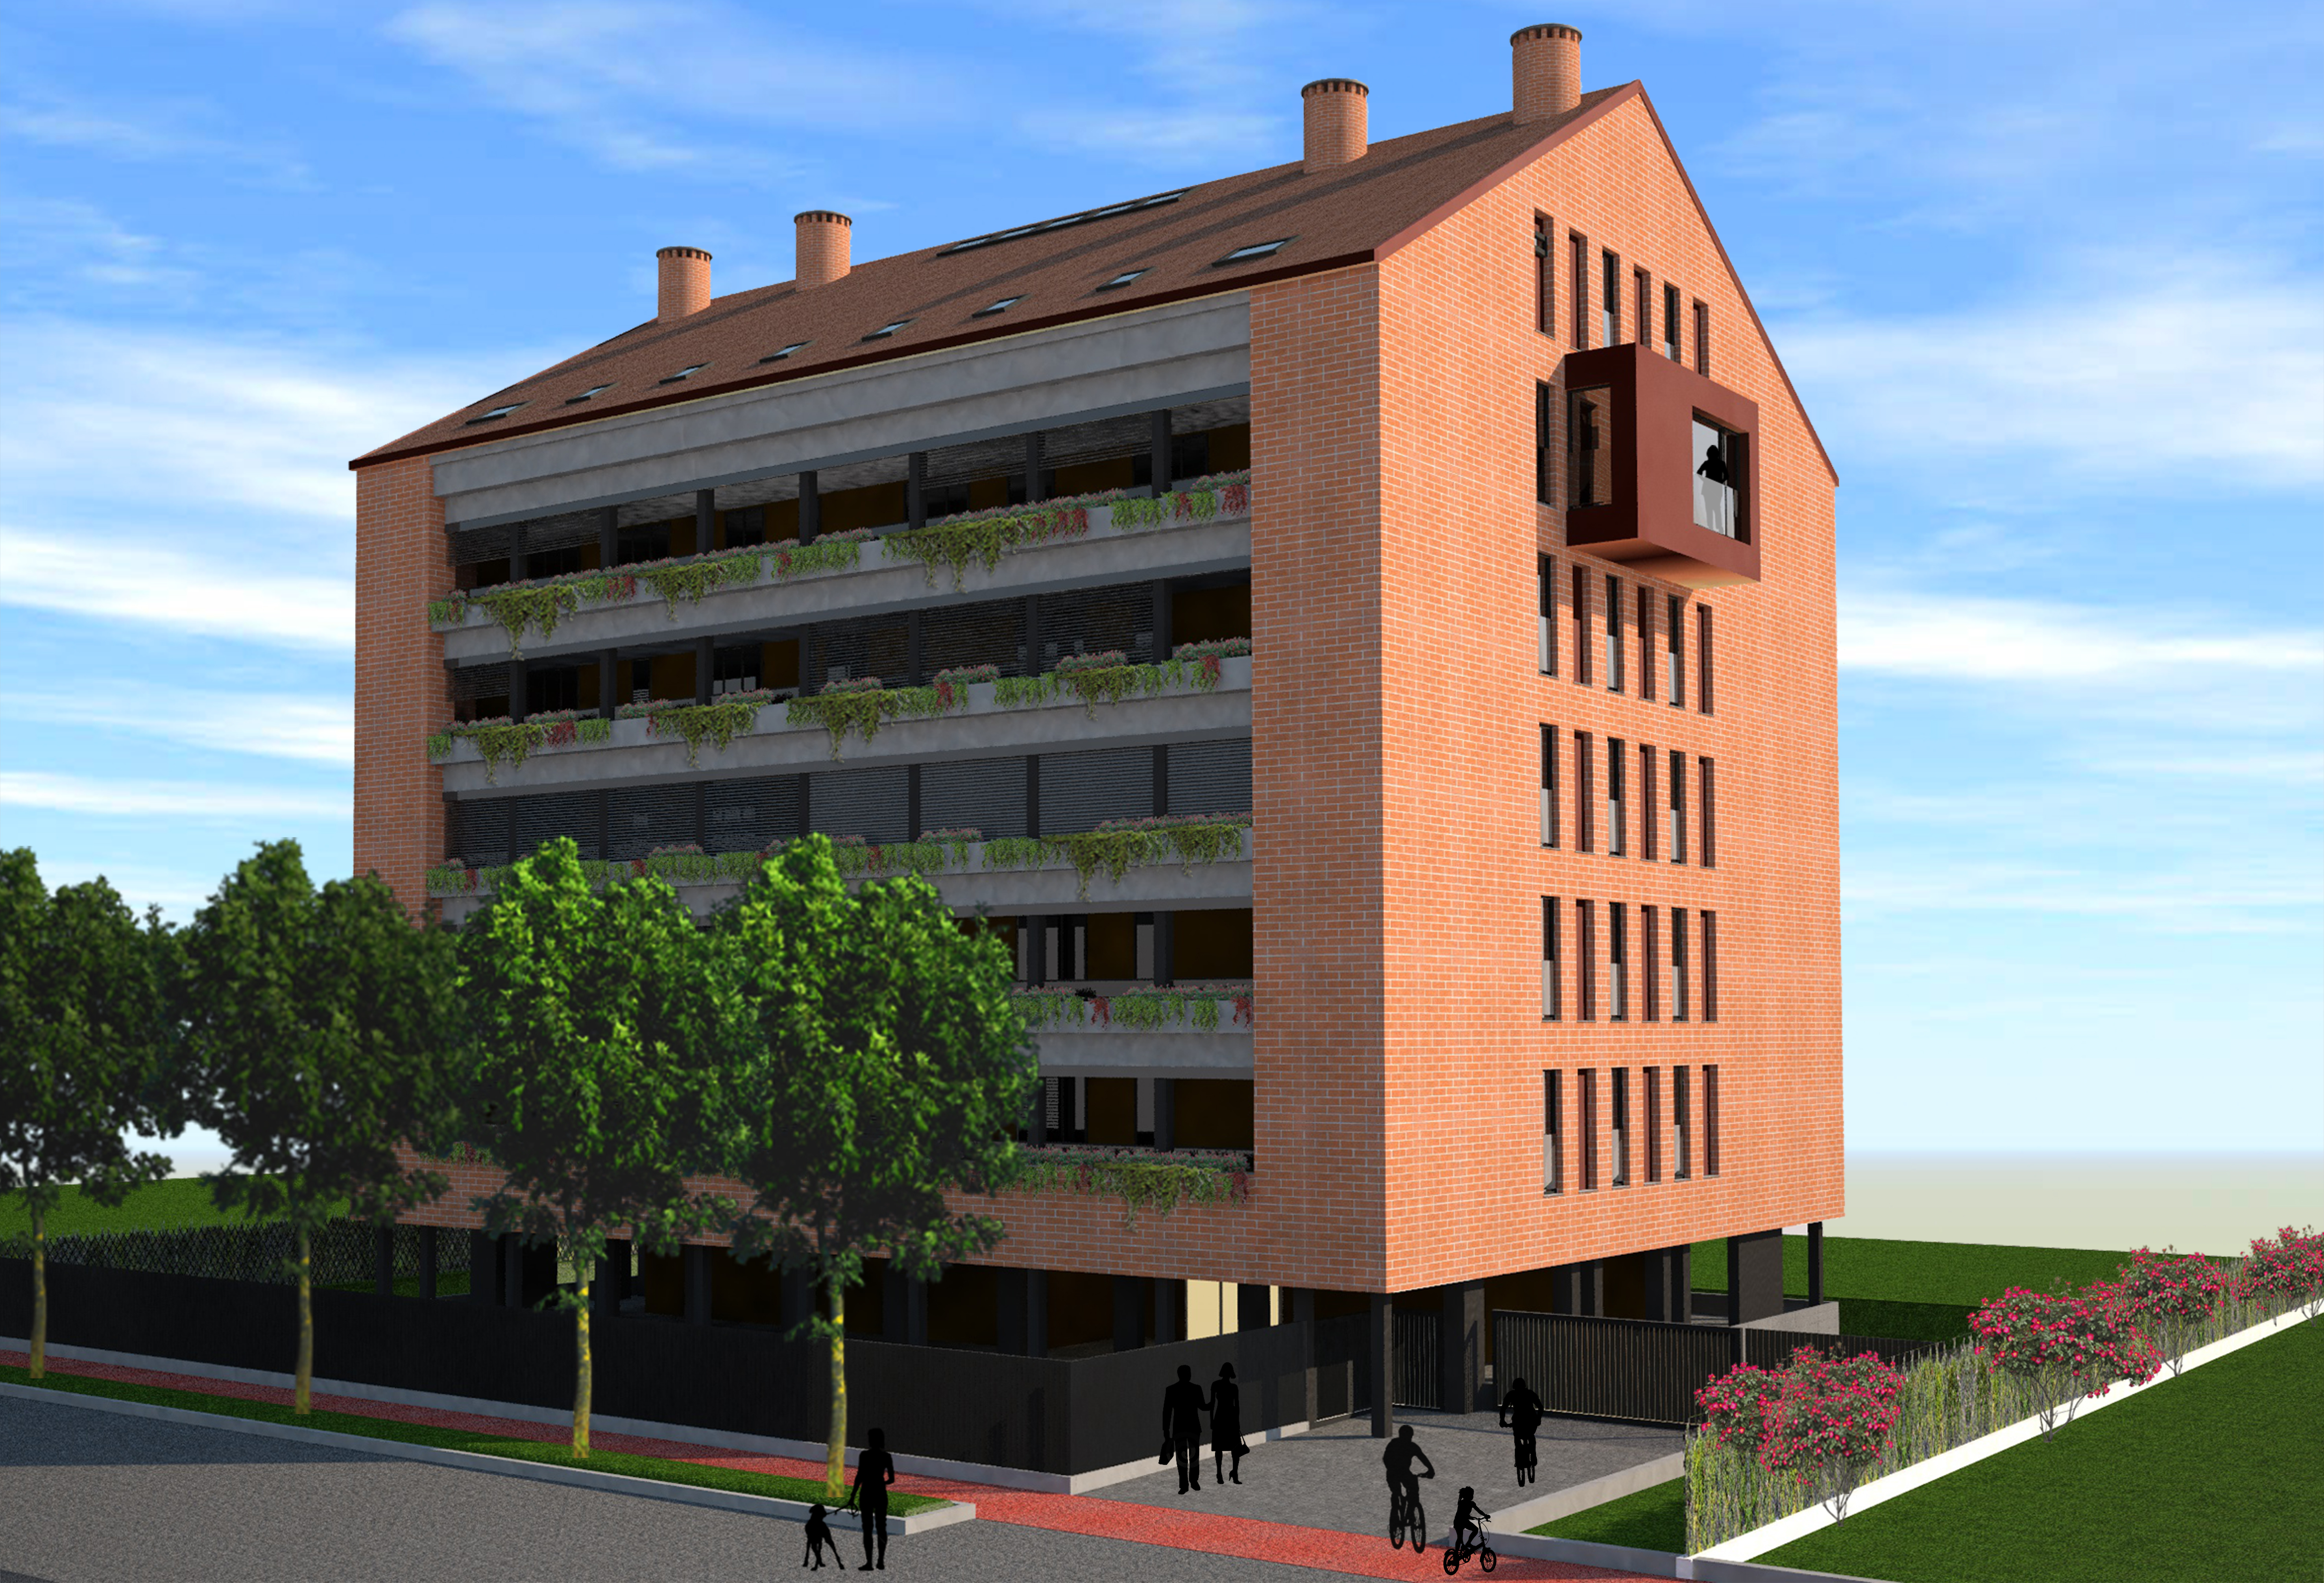 O. Palazzo ULM